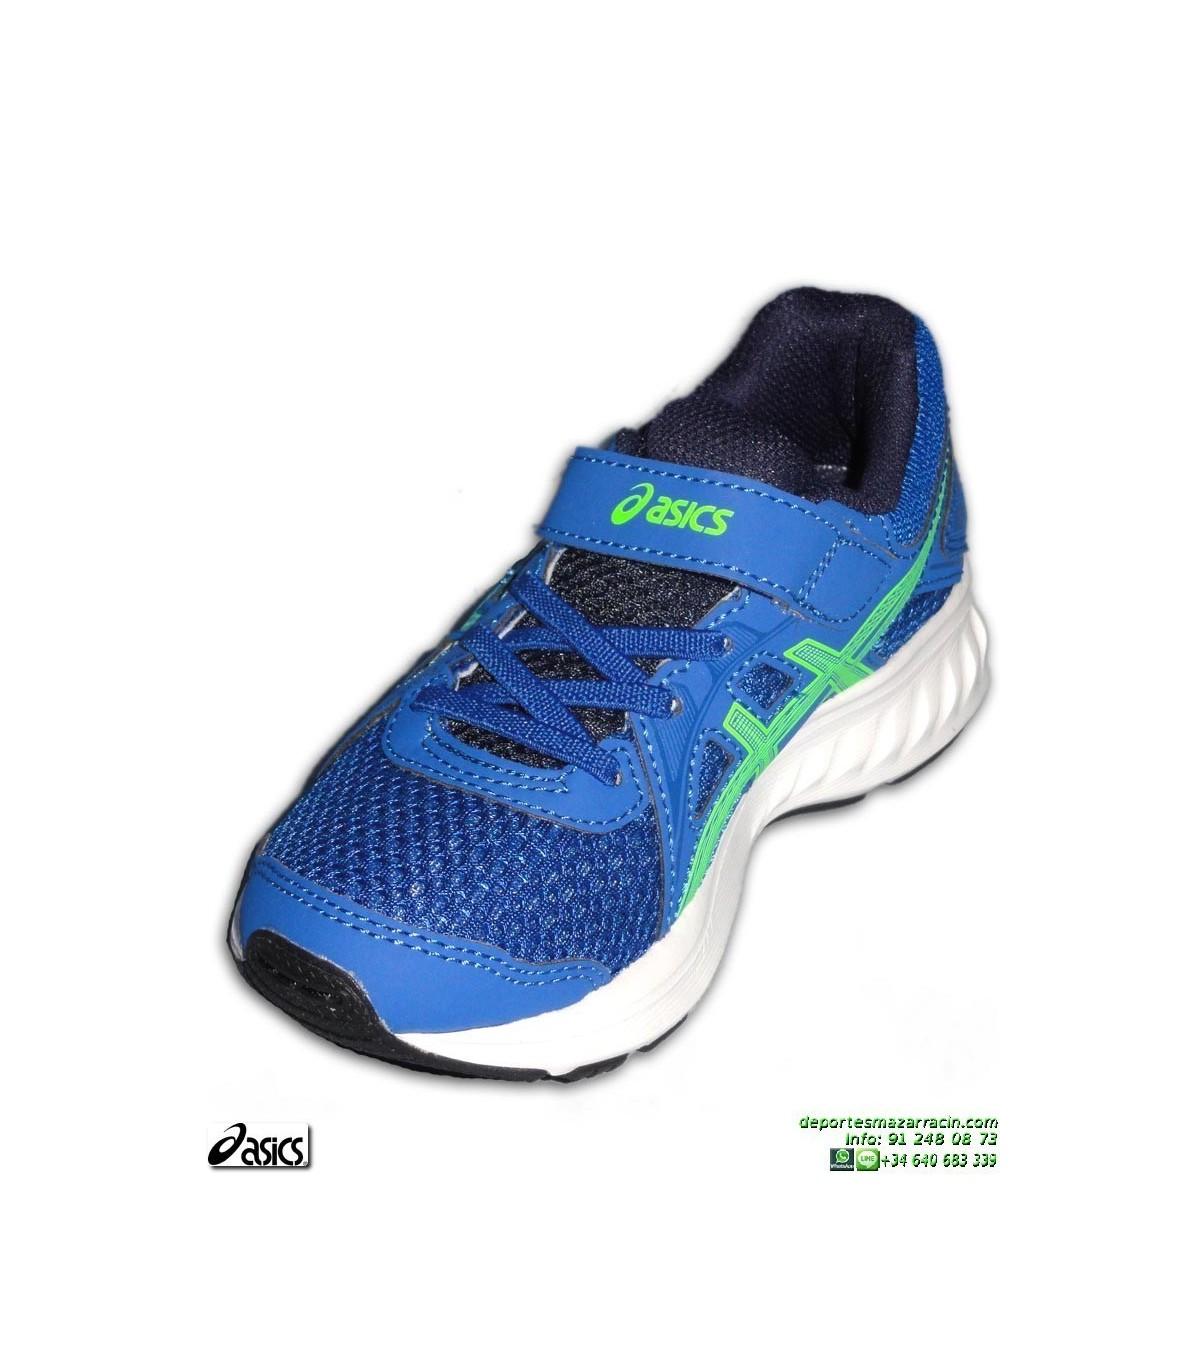 4c4e6066cd6 Zapatilla Running Niños ASICS JOLT 2 PS Velcro Azul deporte